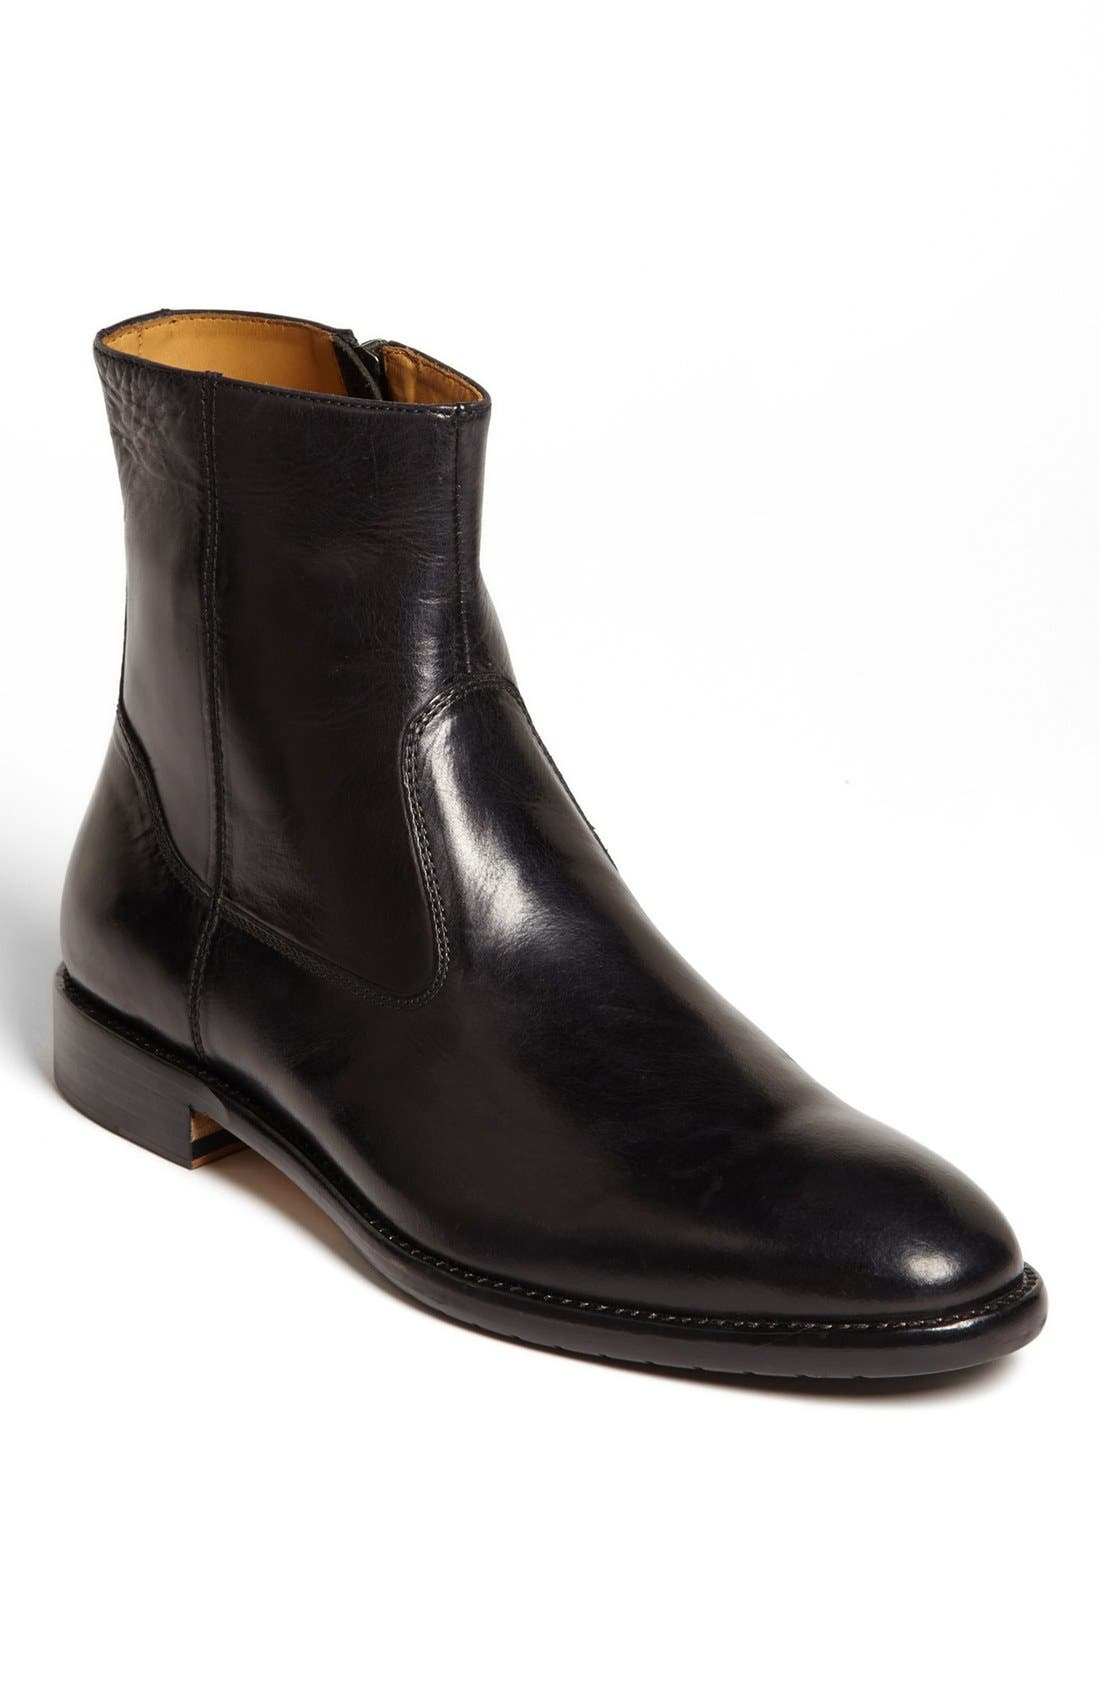 Alternate Image 1 Selected - Gordon Rush 'Stanton' Zip Boot